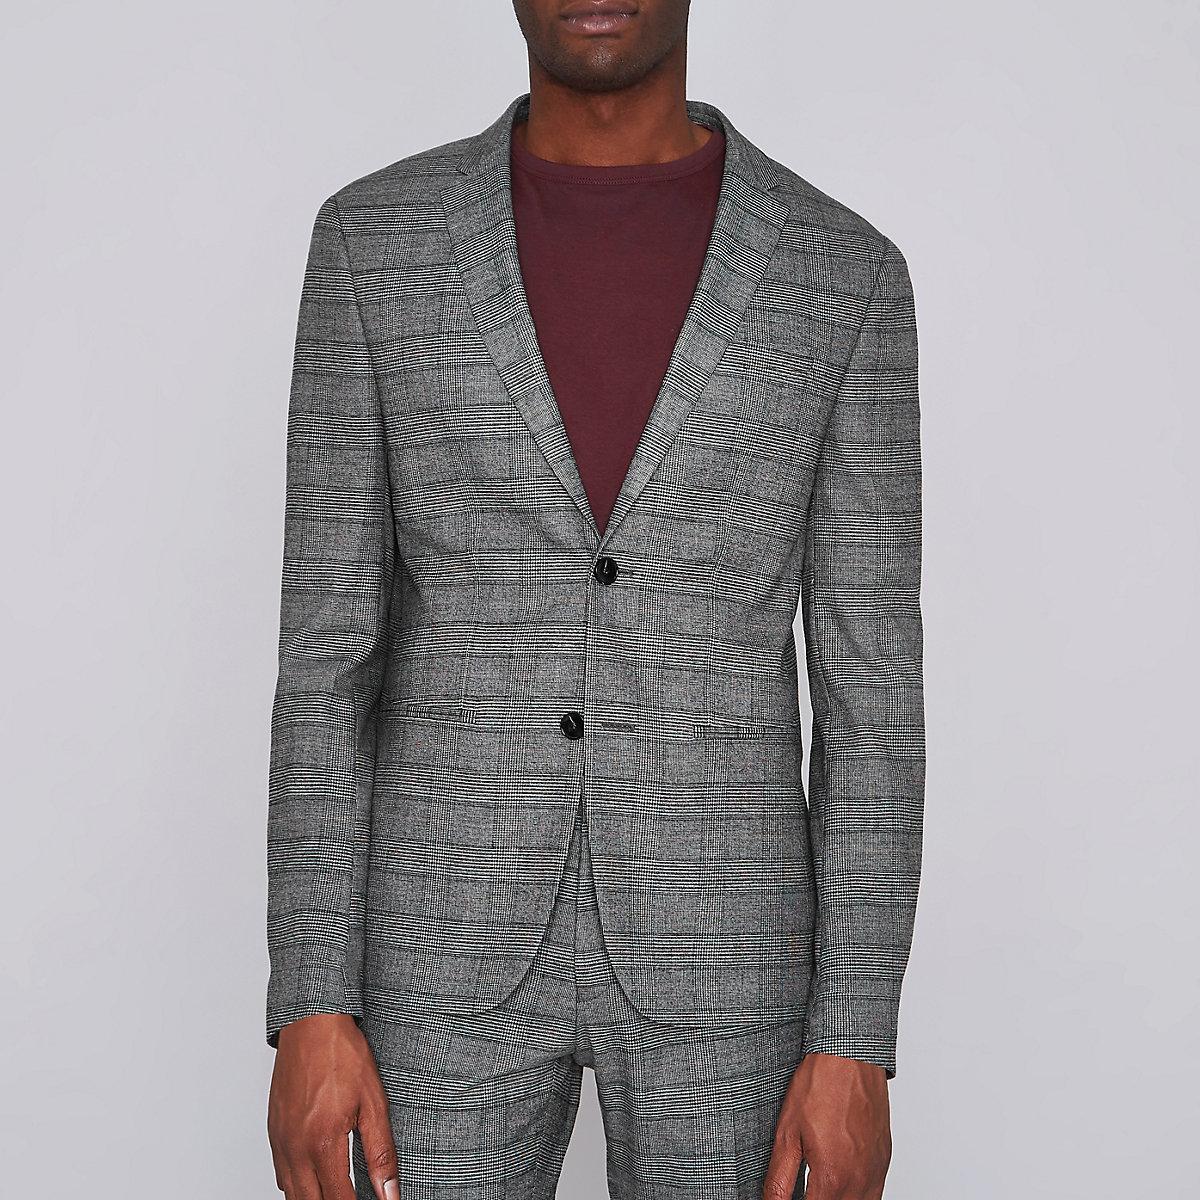 Brown check super skinny suit jacket